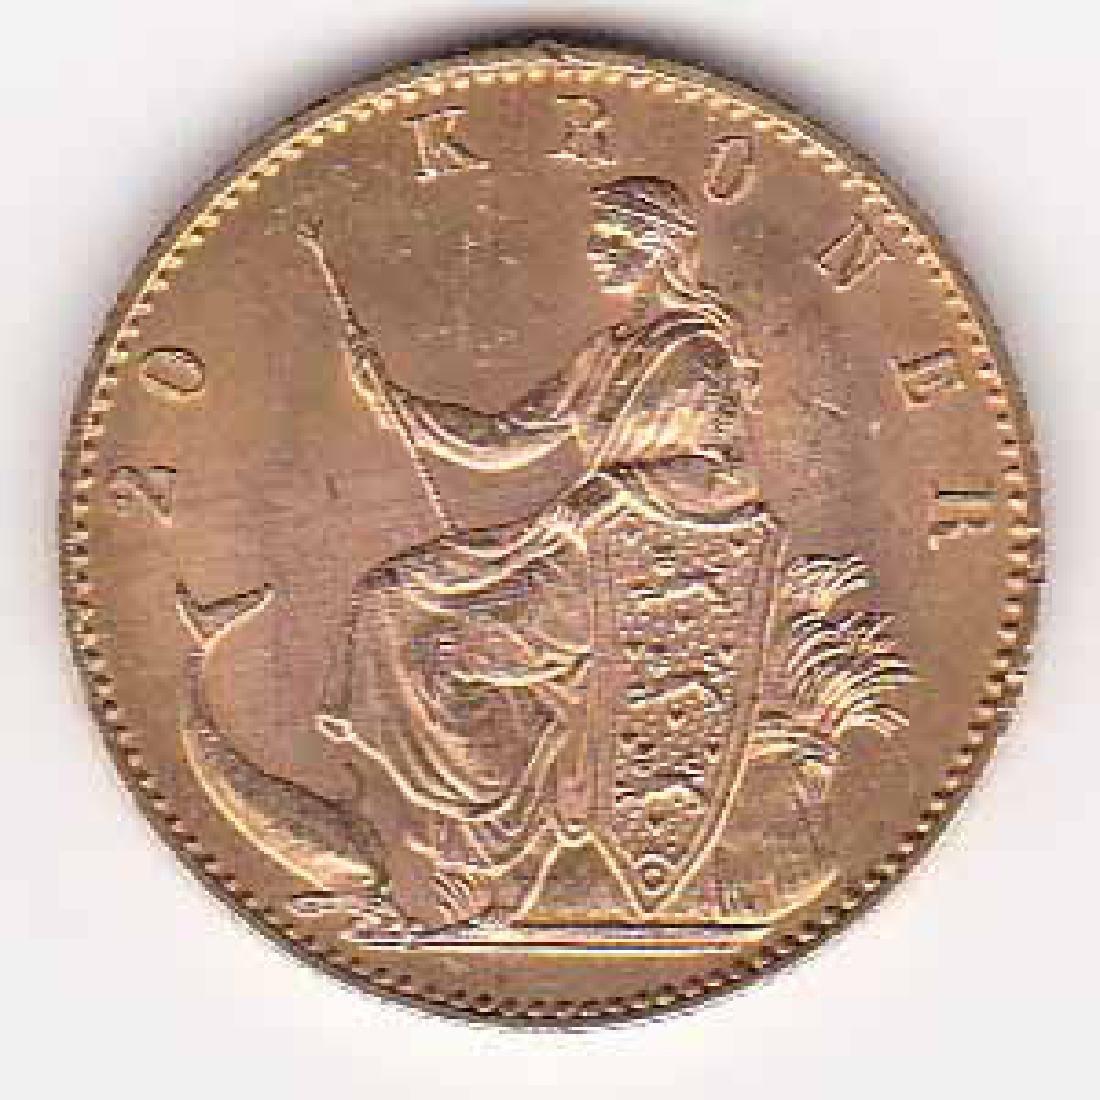 Denmark 20 kroner gold 1900 UNC